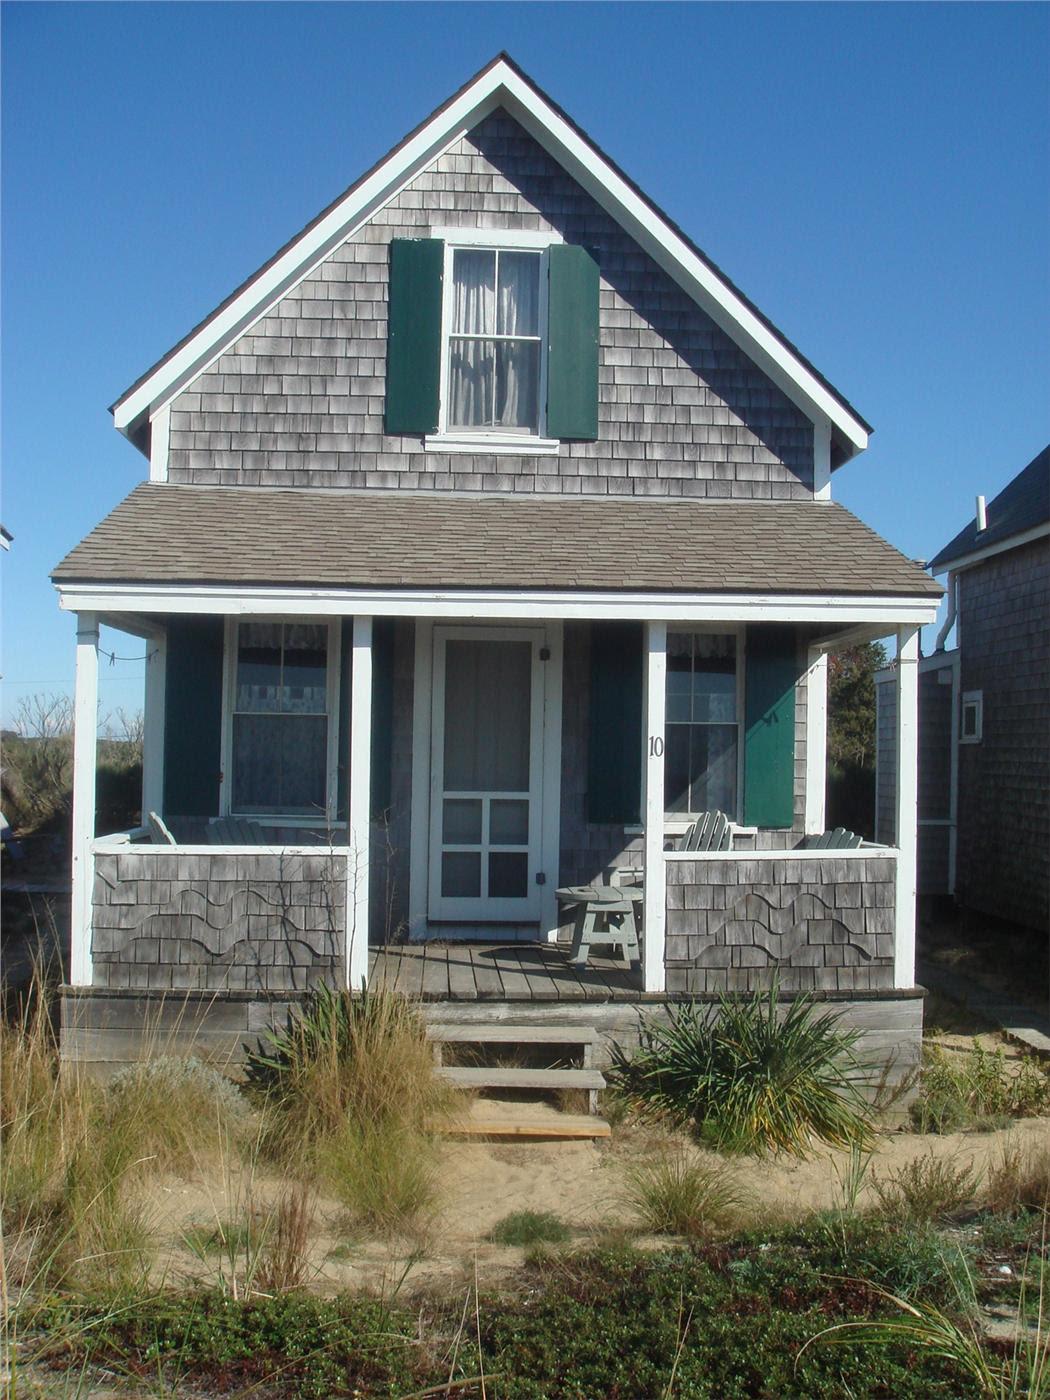 Truro Vacation Rental home in Cape Cod MA 02666 A few